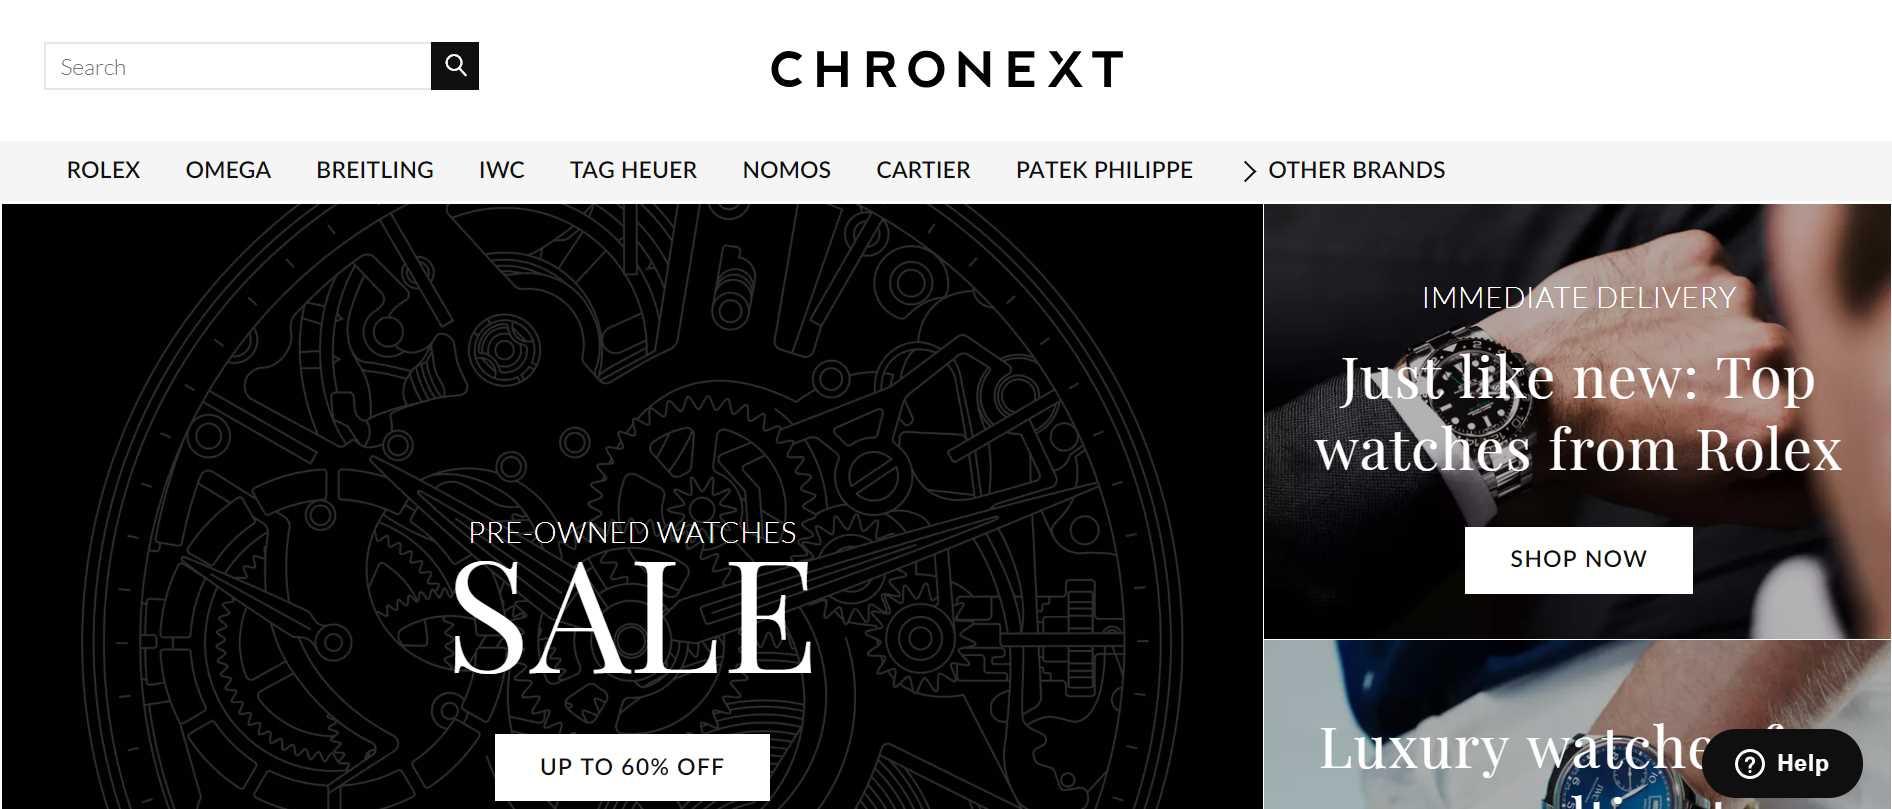 chronext luxury watches online